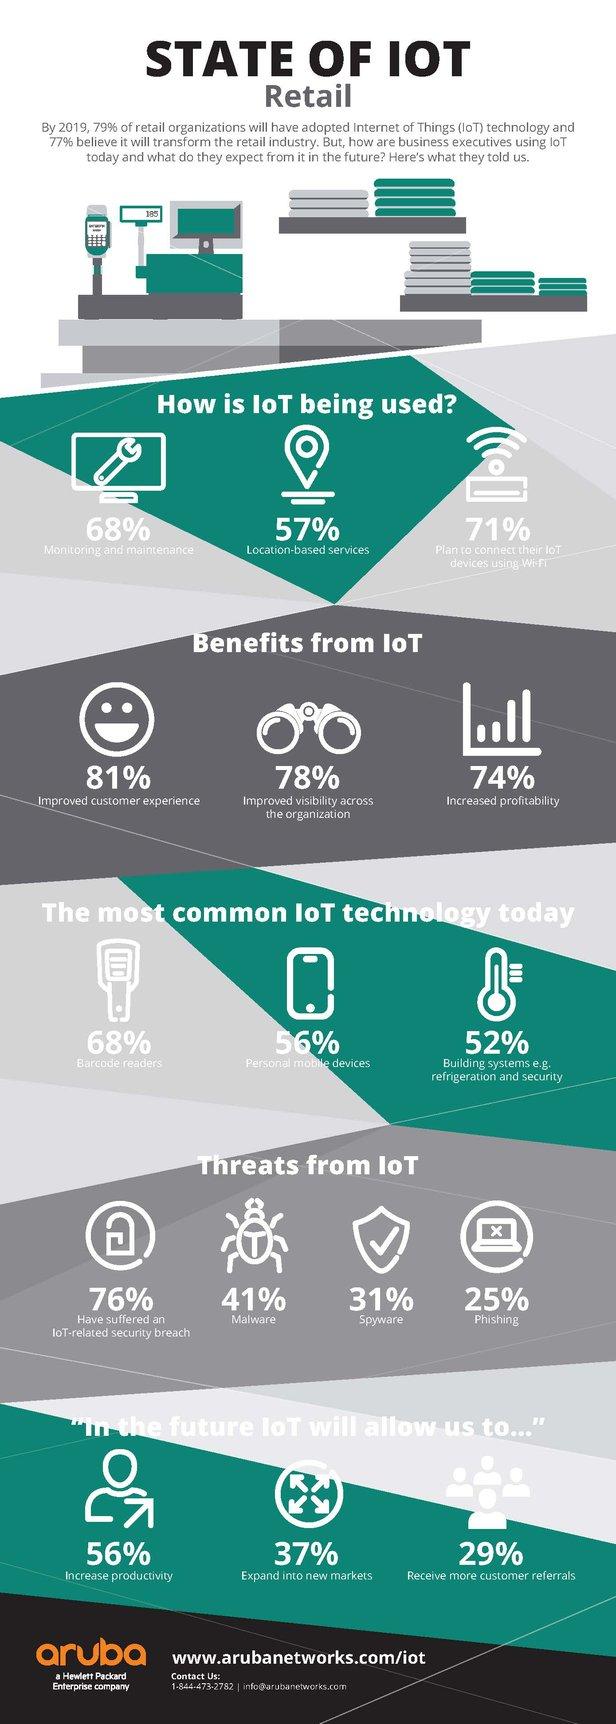 Aruba_IoT_Retail_Infographic.jpg